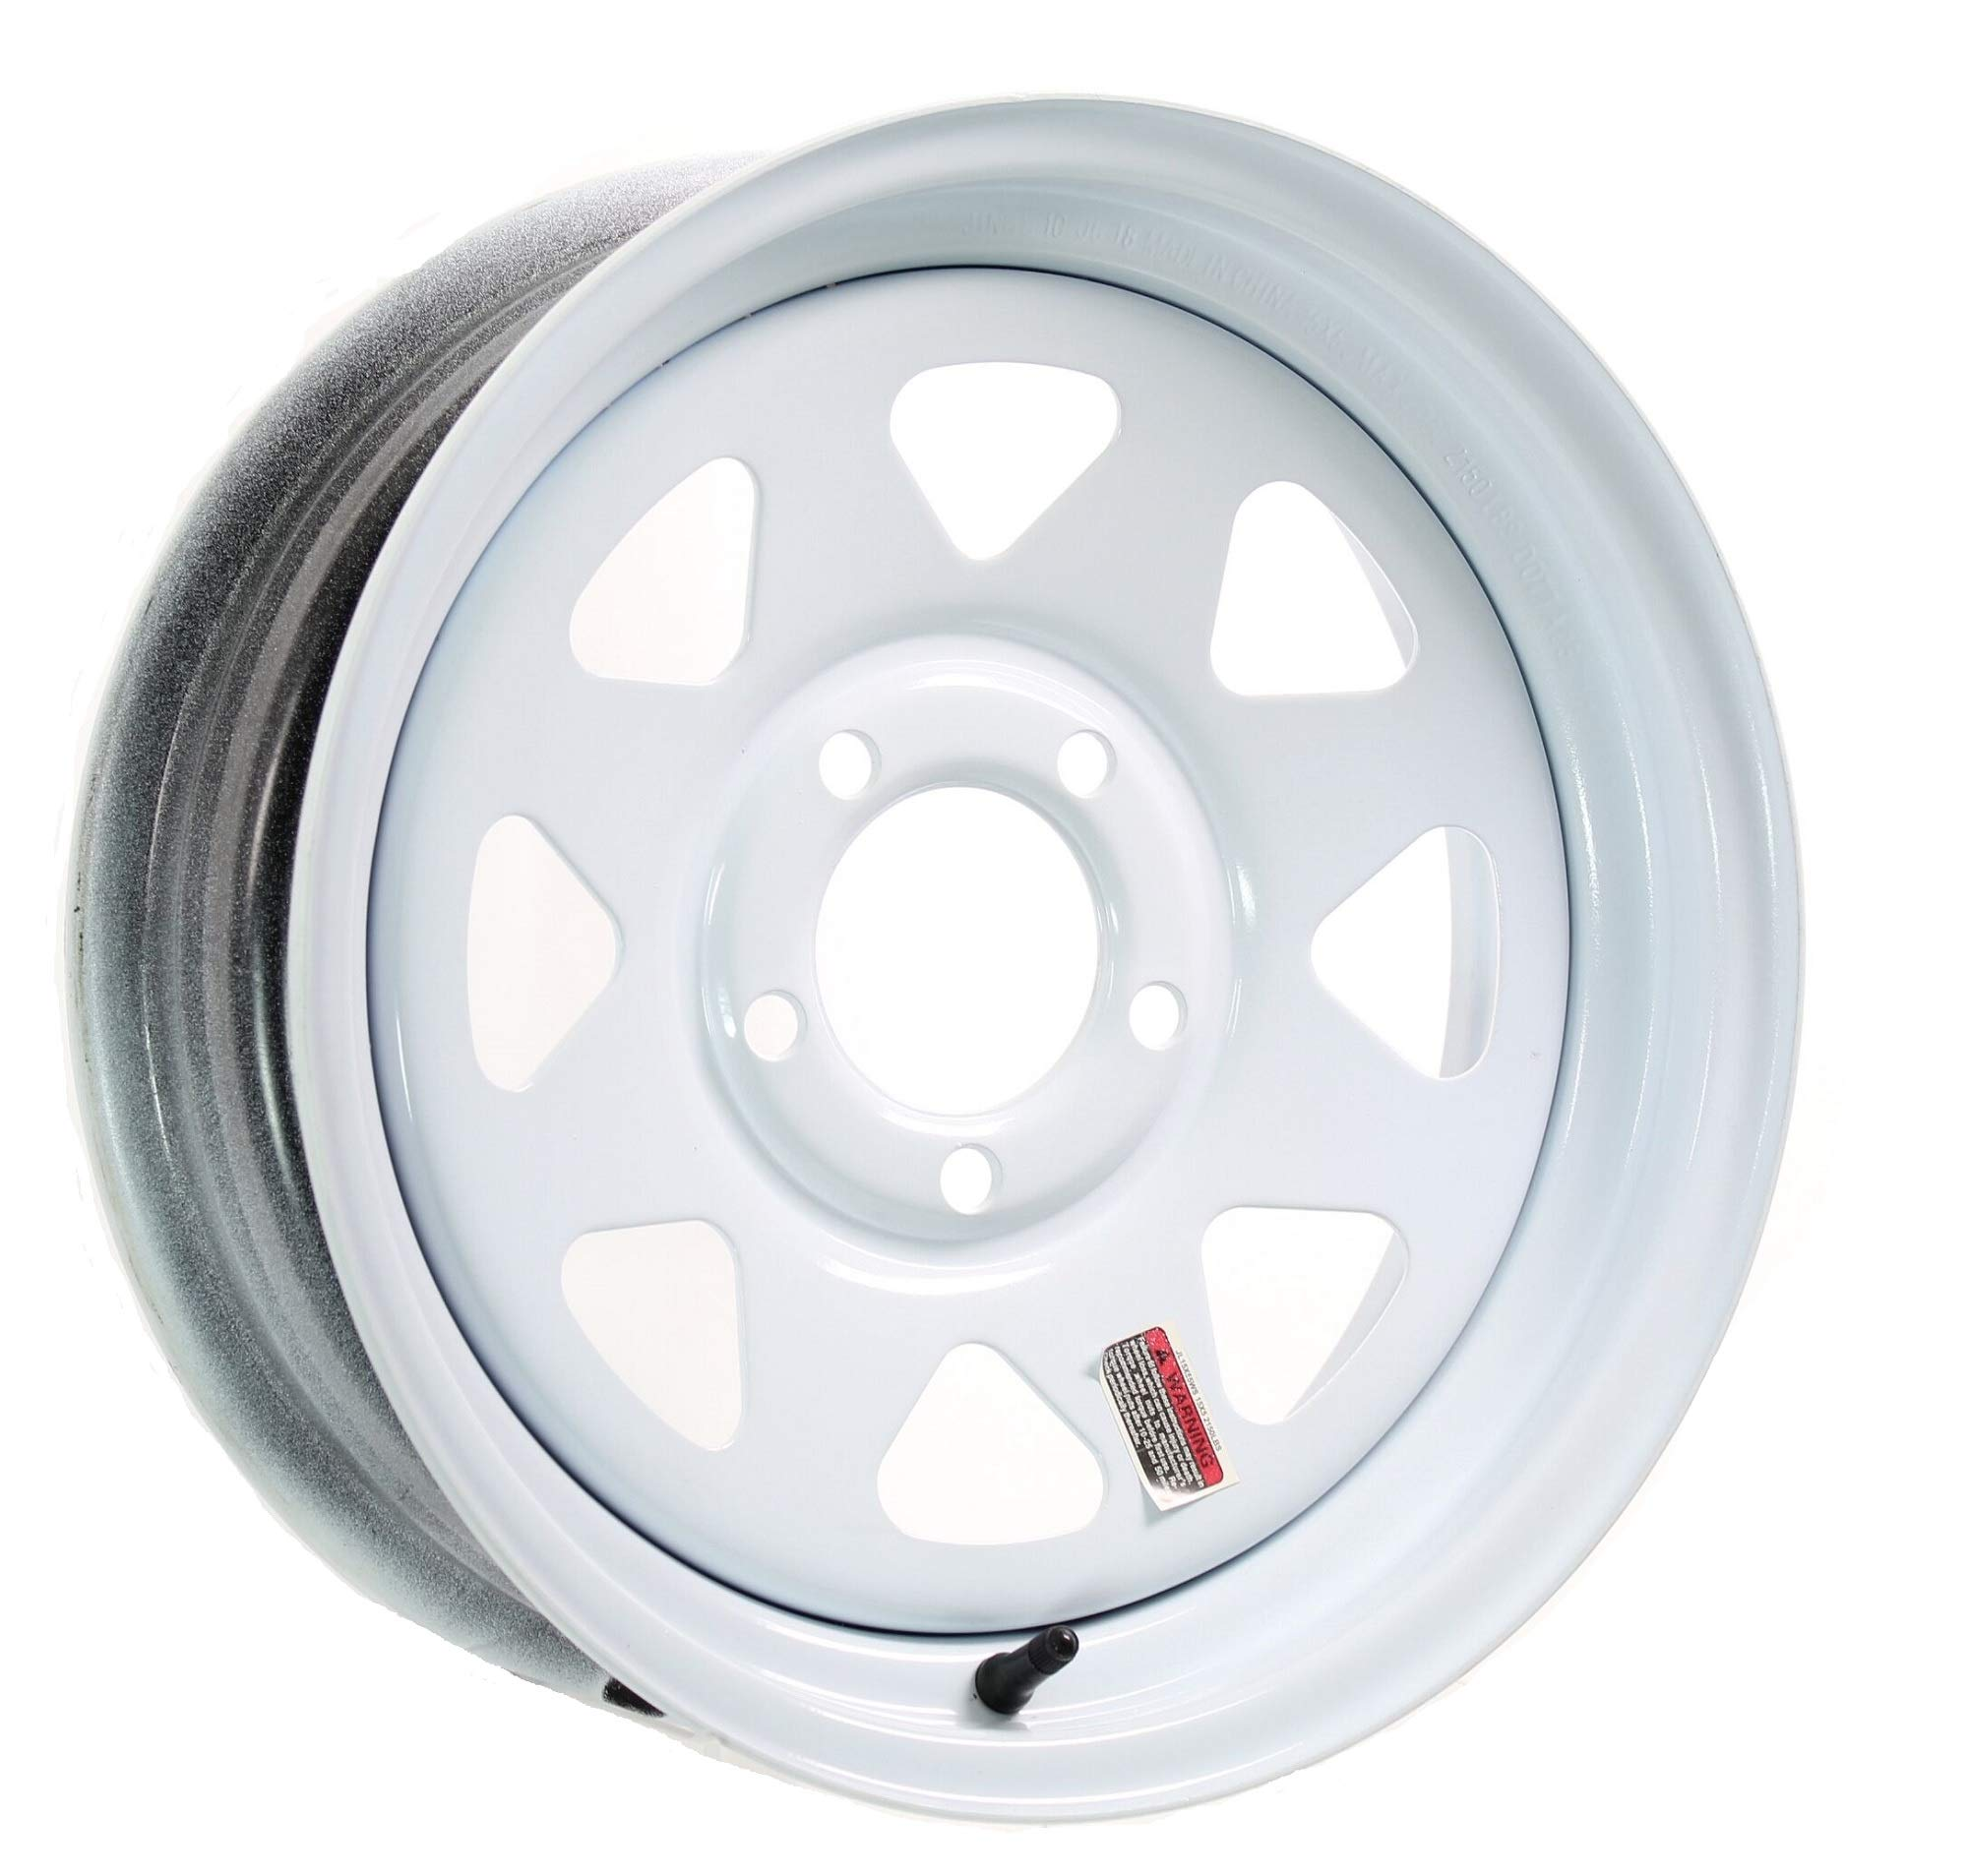 eCustomRim Trailer Wheel Rim 15X5 J 5-4.5 White Spoke 2150 Lb. 3.19CB